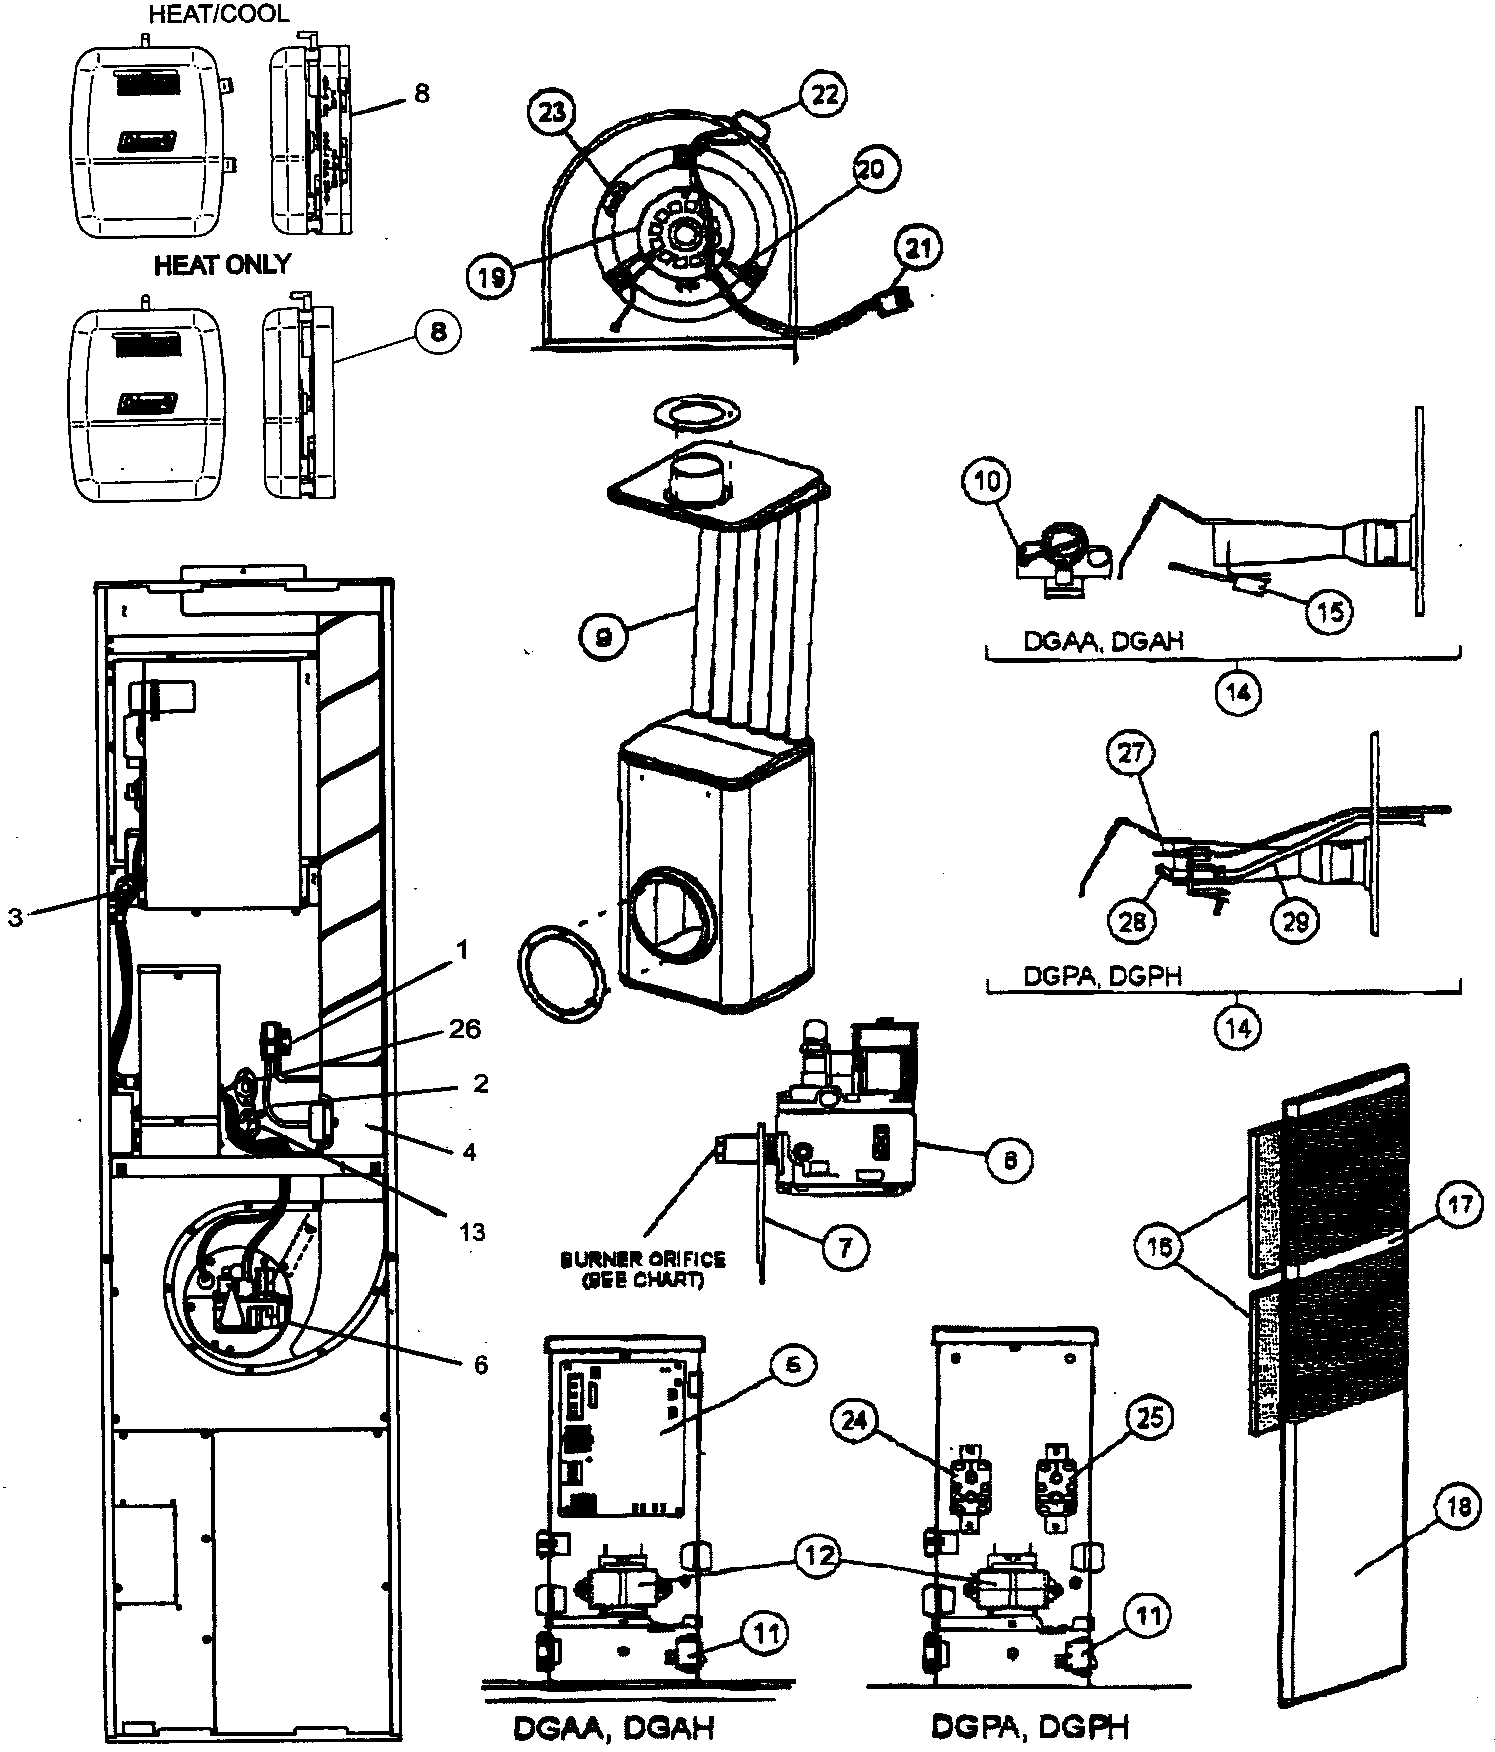 small resolution of coleman furnace schematics wiring diagram mega coleman furnace schematics